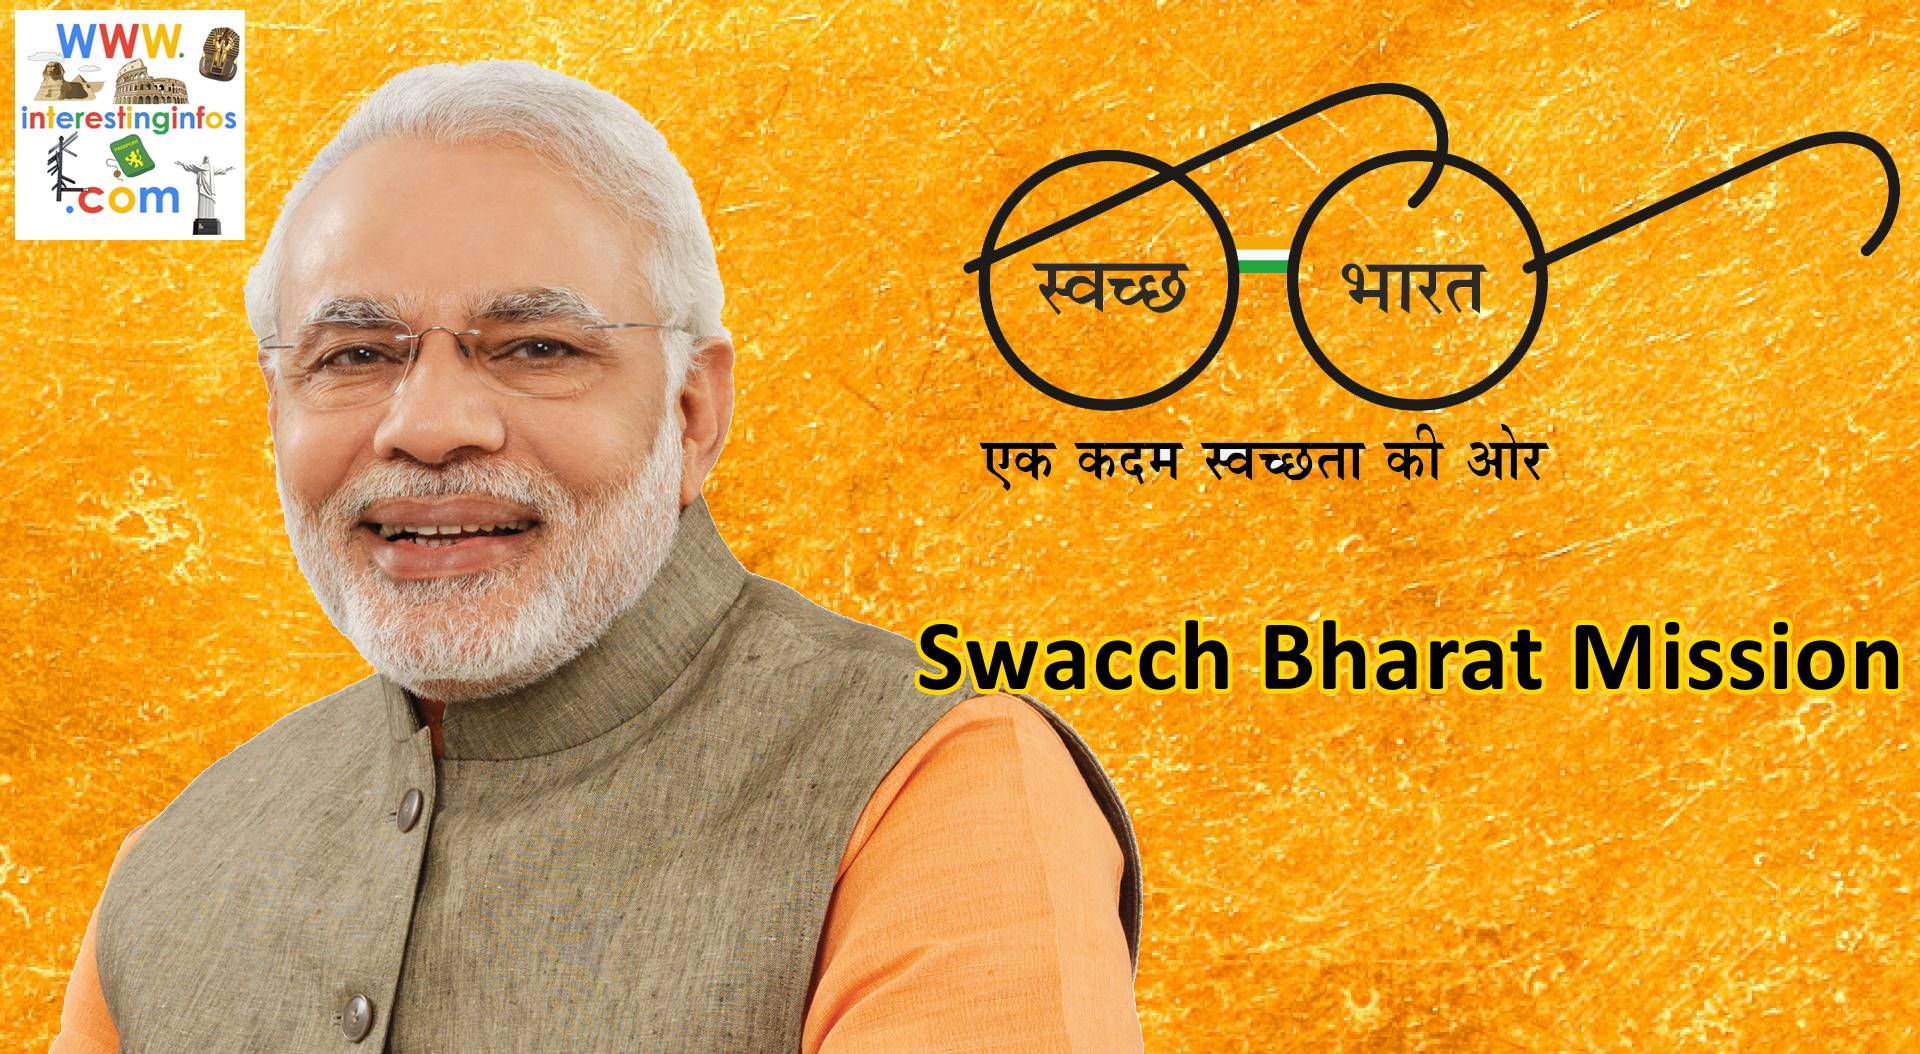 Narendra modi Swacch Bharat